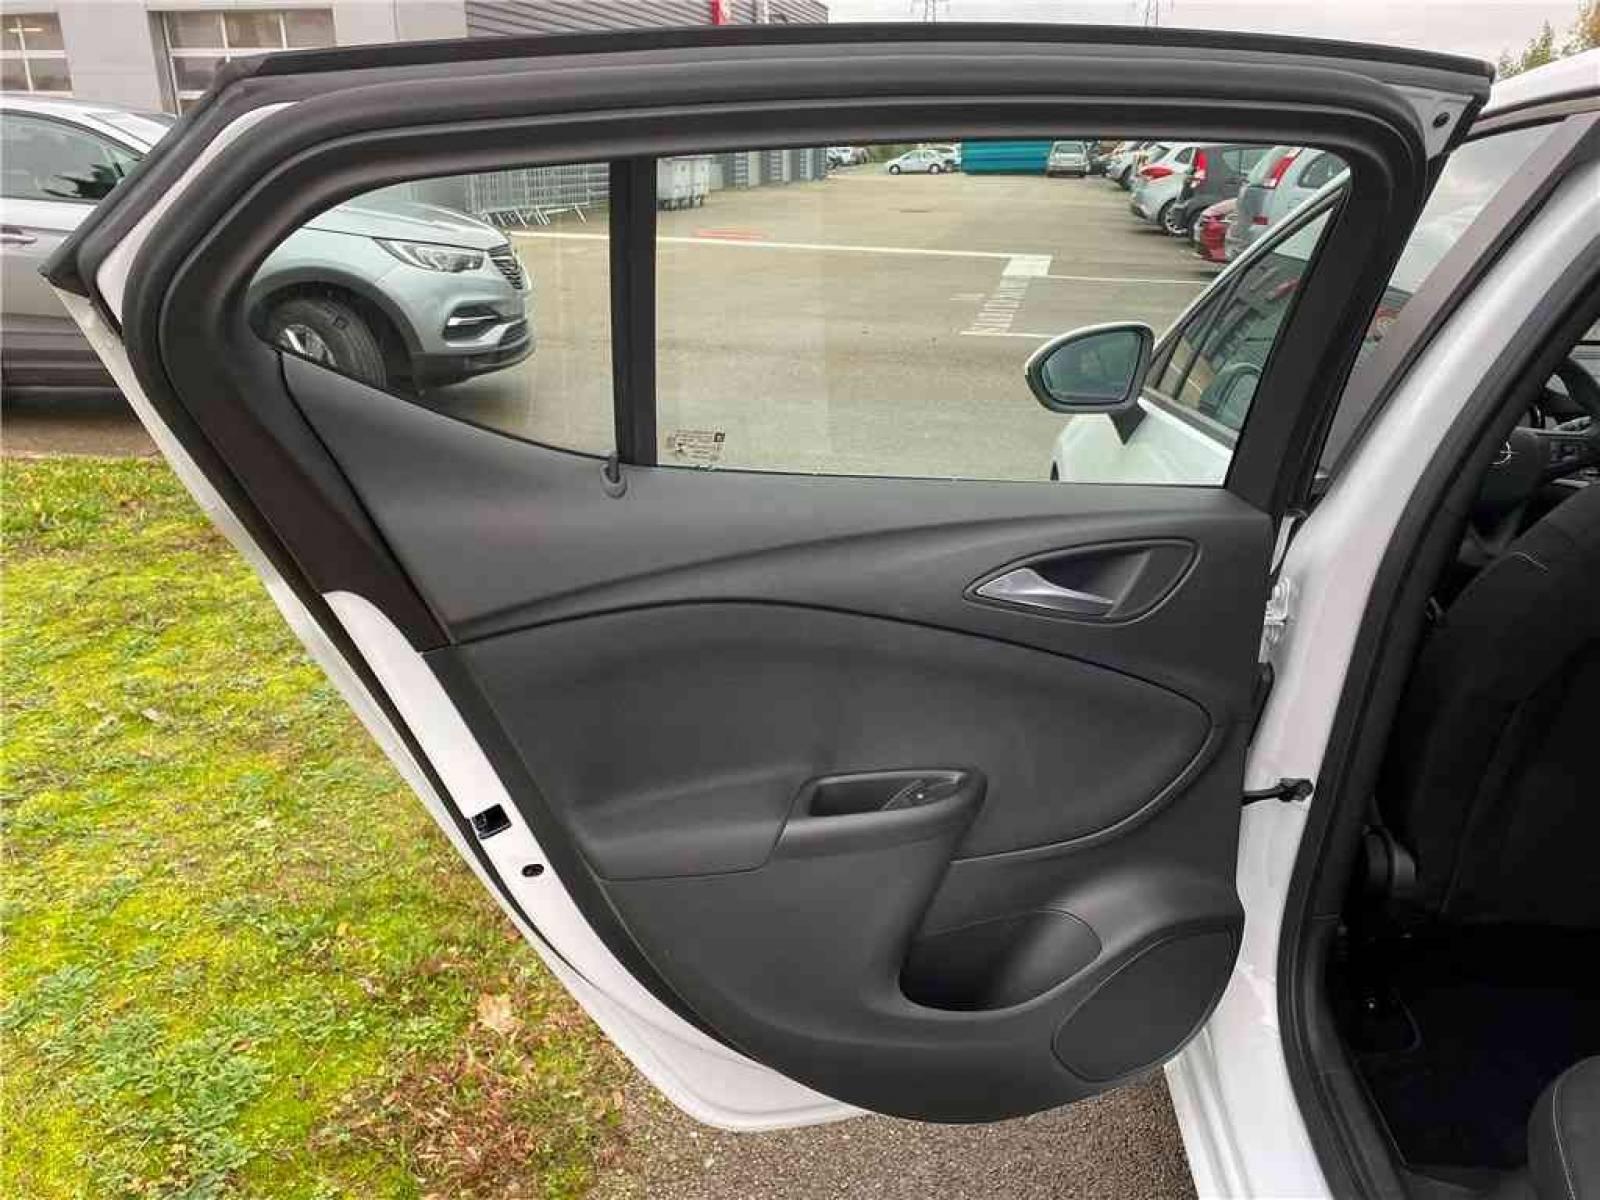 OPEL Astra 1.5 Diesel 105 ch BVM6 - véhicule d'occasion - Groupe Guillet - Opel Magicauto - Chalon-sur-Saône - 71380 - Saint-Marcel - 29